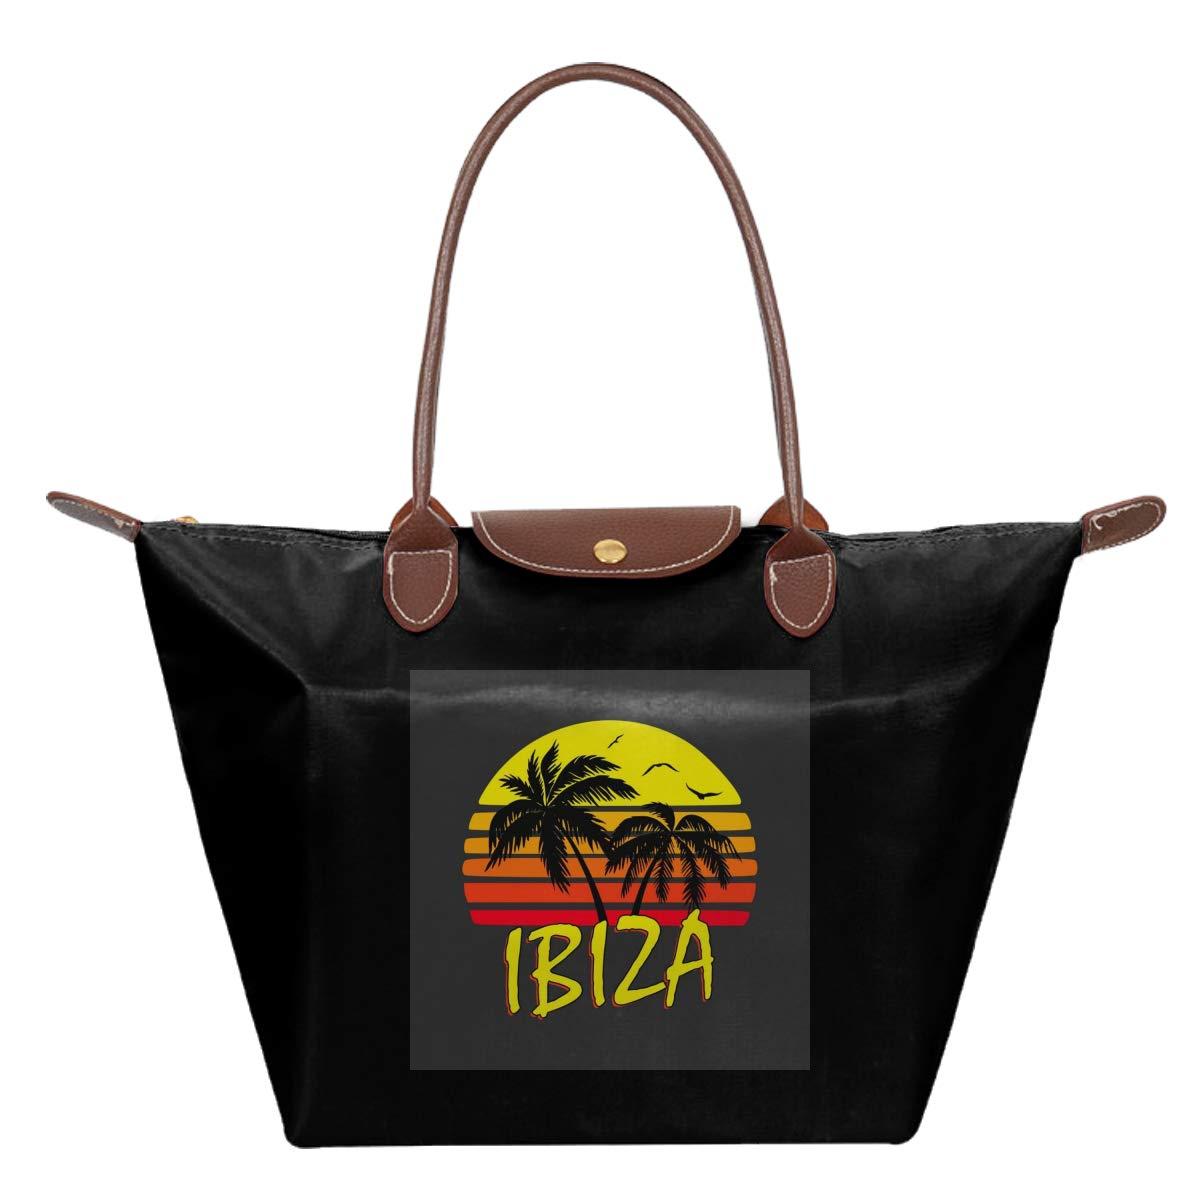 Ibiza Vintage Sun Waterproof Leather Folded Messenger Nylon Bag Travel Tote Hopping Folding School Handbags